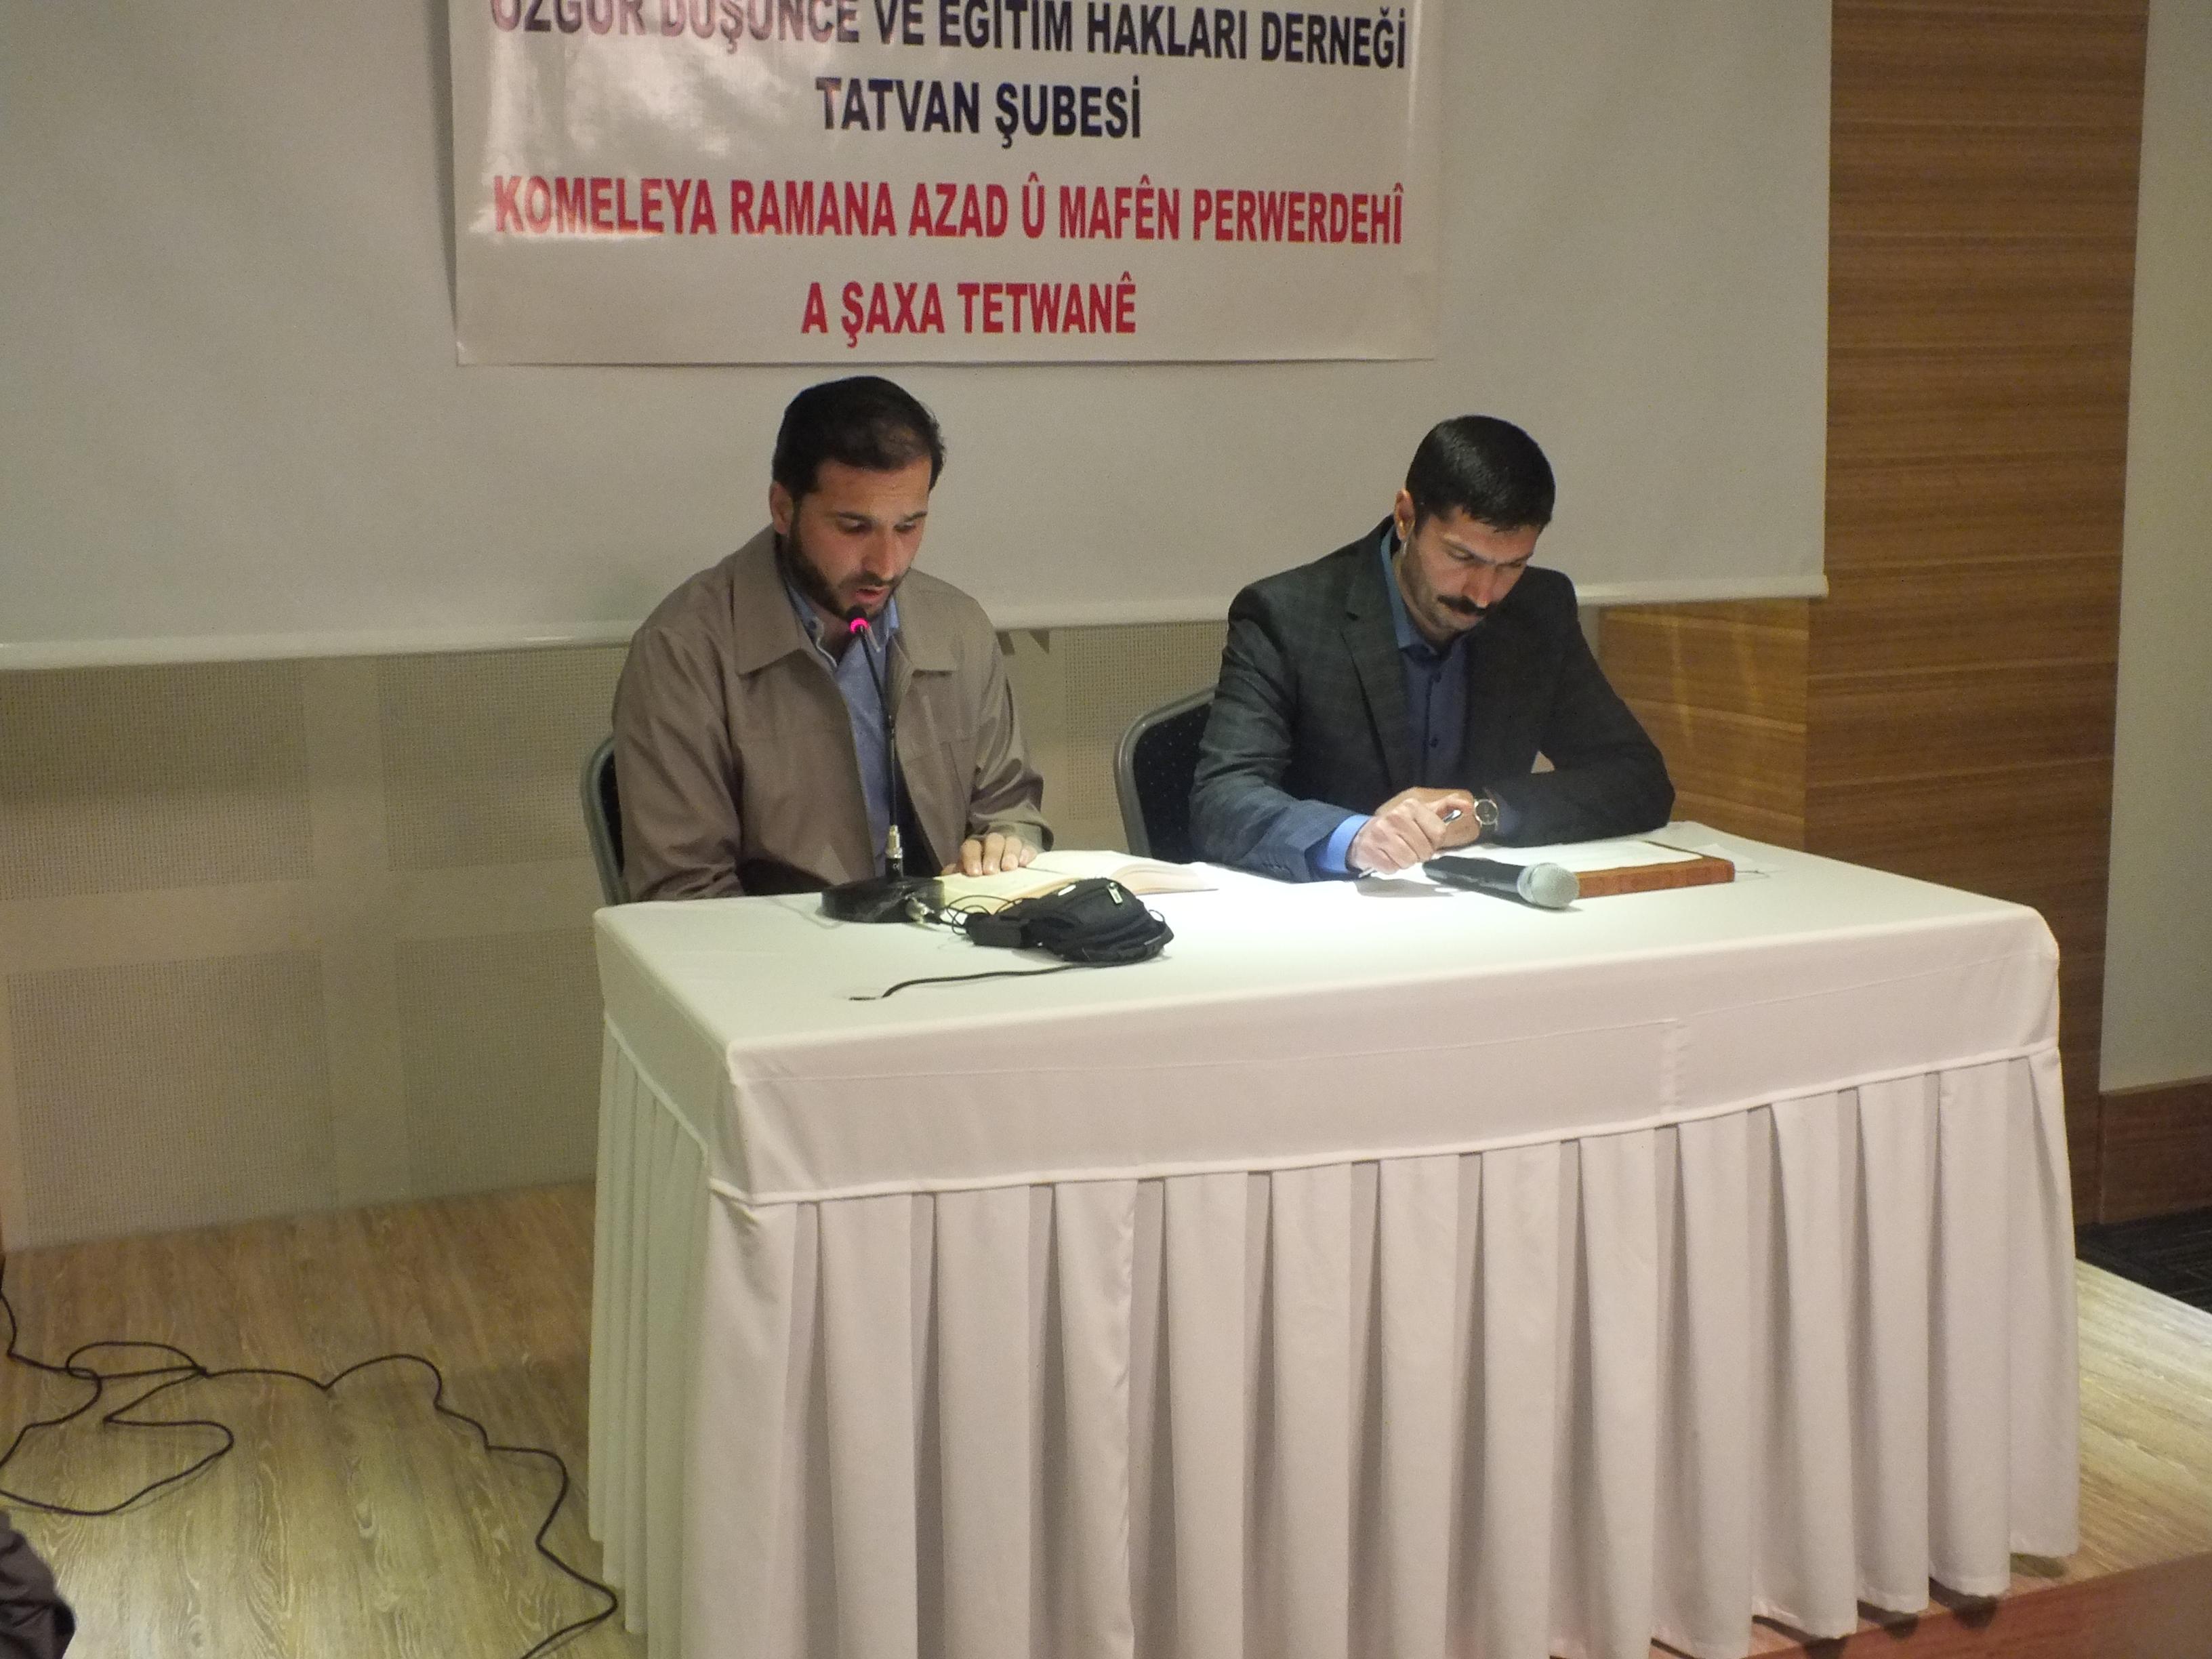 tatvan_ozgur-der_cuma_seminerleri_basladi-(2).jpg